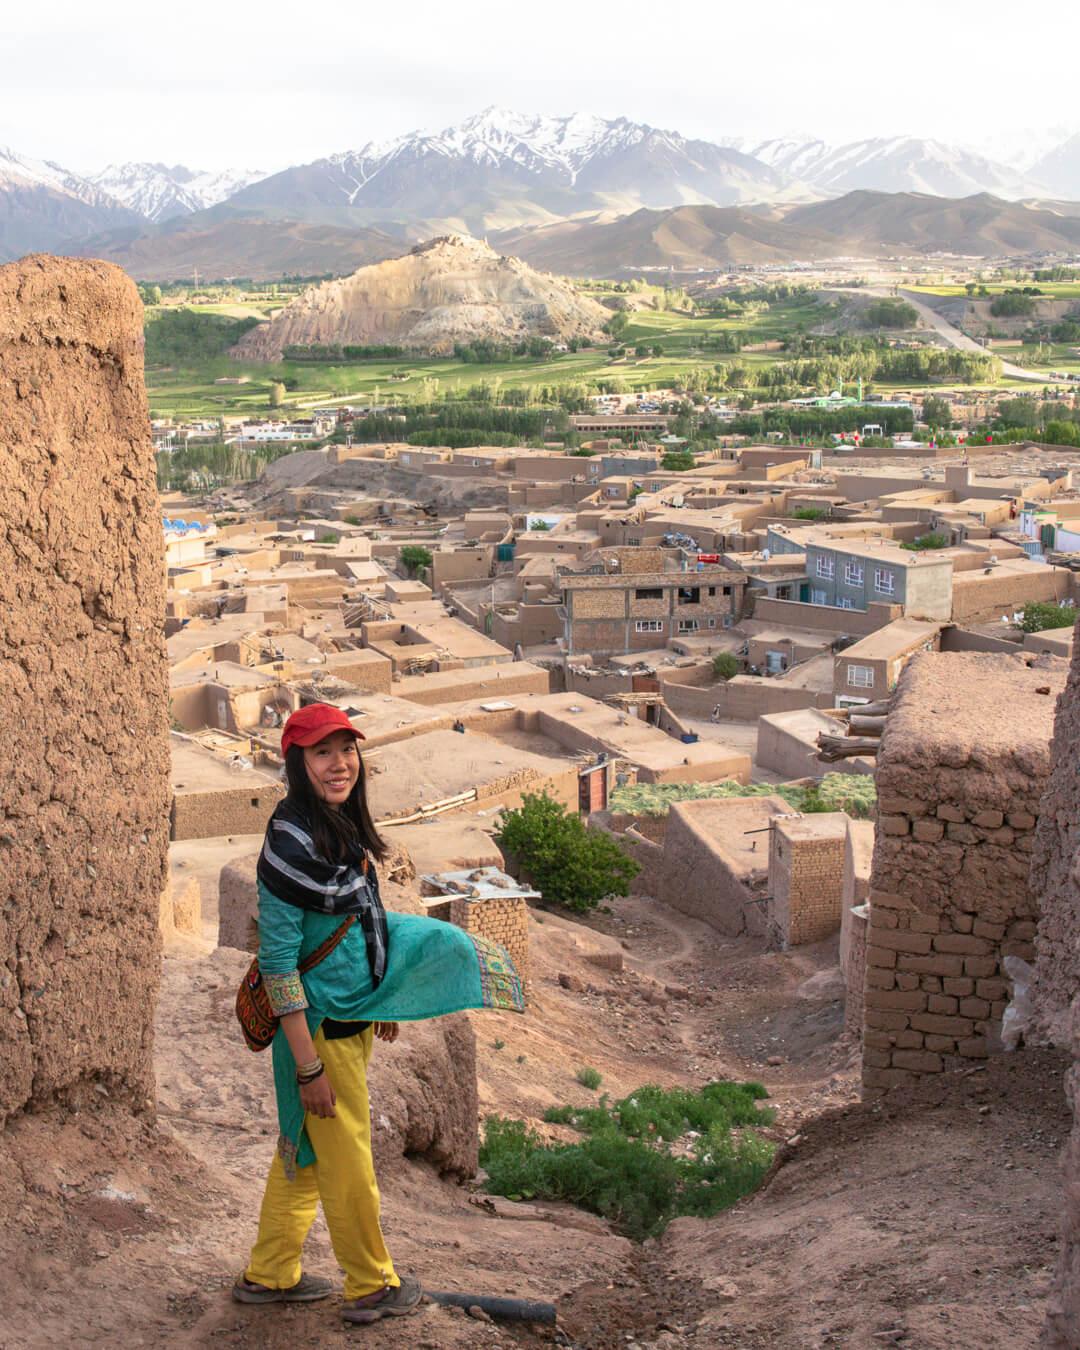 Marsha Jean, Afghanistan backpacker, in Bamiyan.